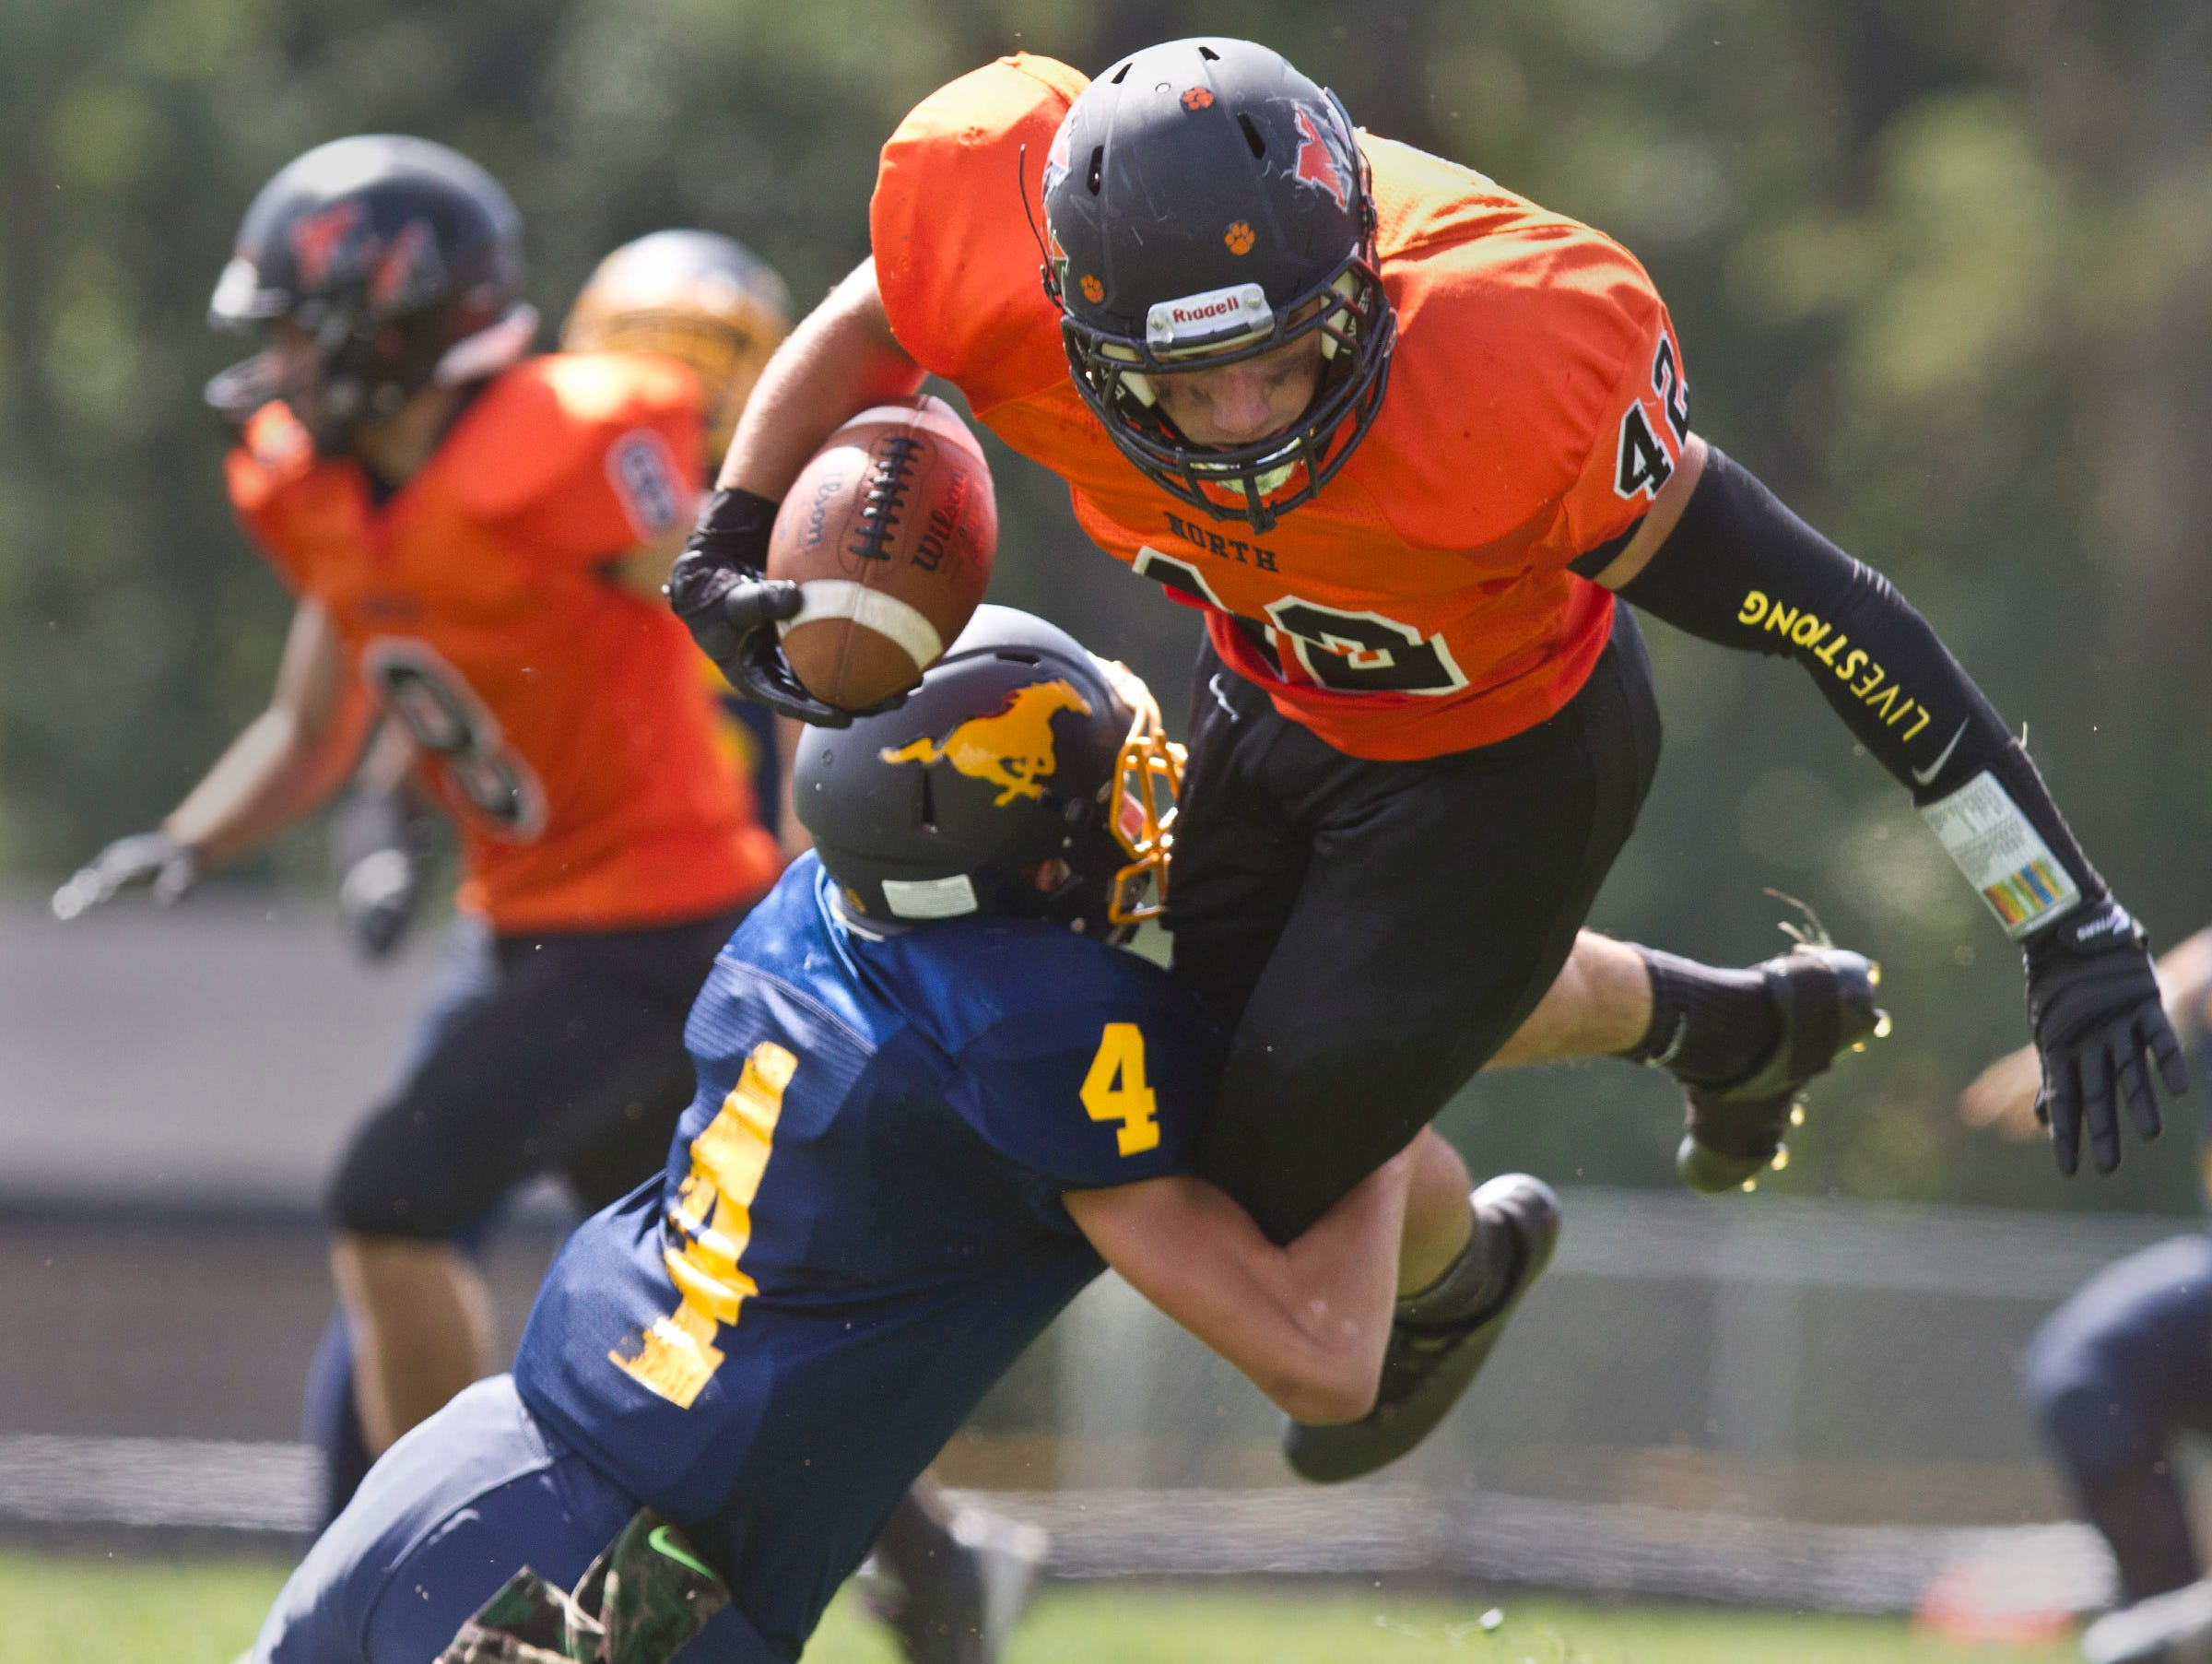 Middletown North's Chad Freshnock tries to jump over Marlboro's Chris Ottaviano Middletown North vs Marlboro football. Marlboro, NJ Saturday, September 19, 2015 @dhoodhood